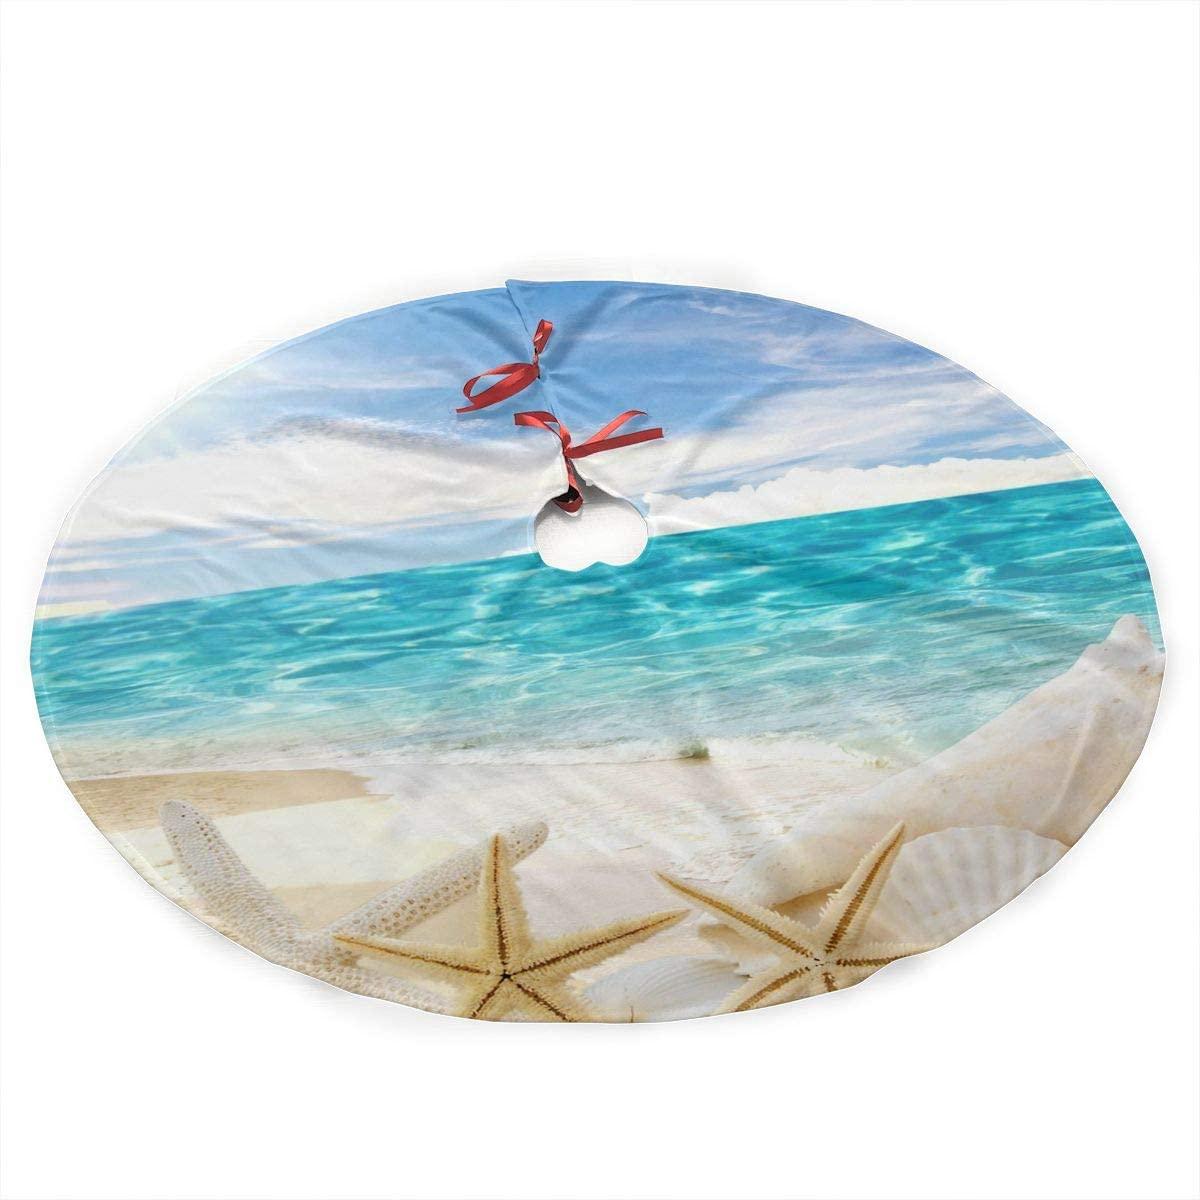 ADELBERT HENDEICKSO Beach Sand Shells White Starfish Novelty Christmas Tree Skirt 35.5